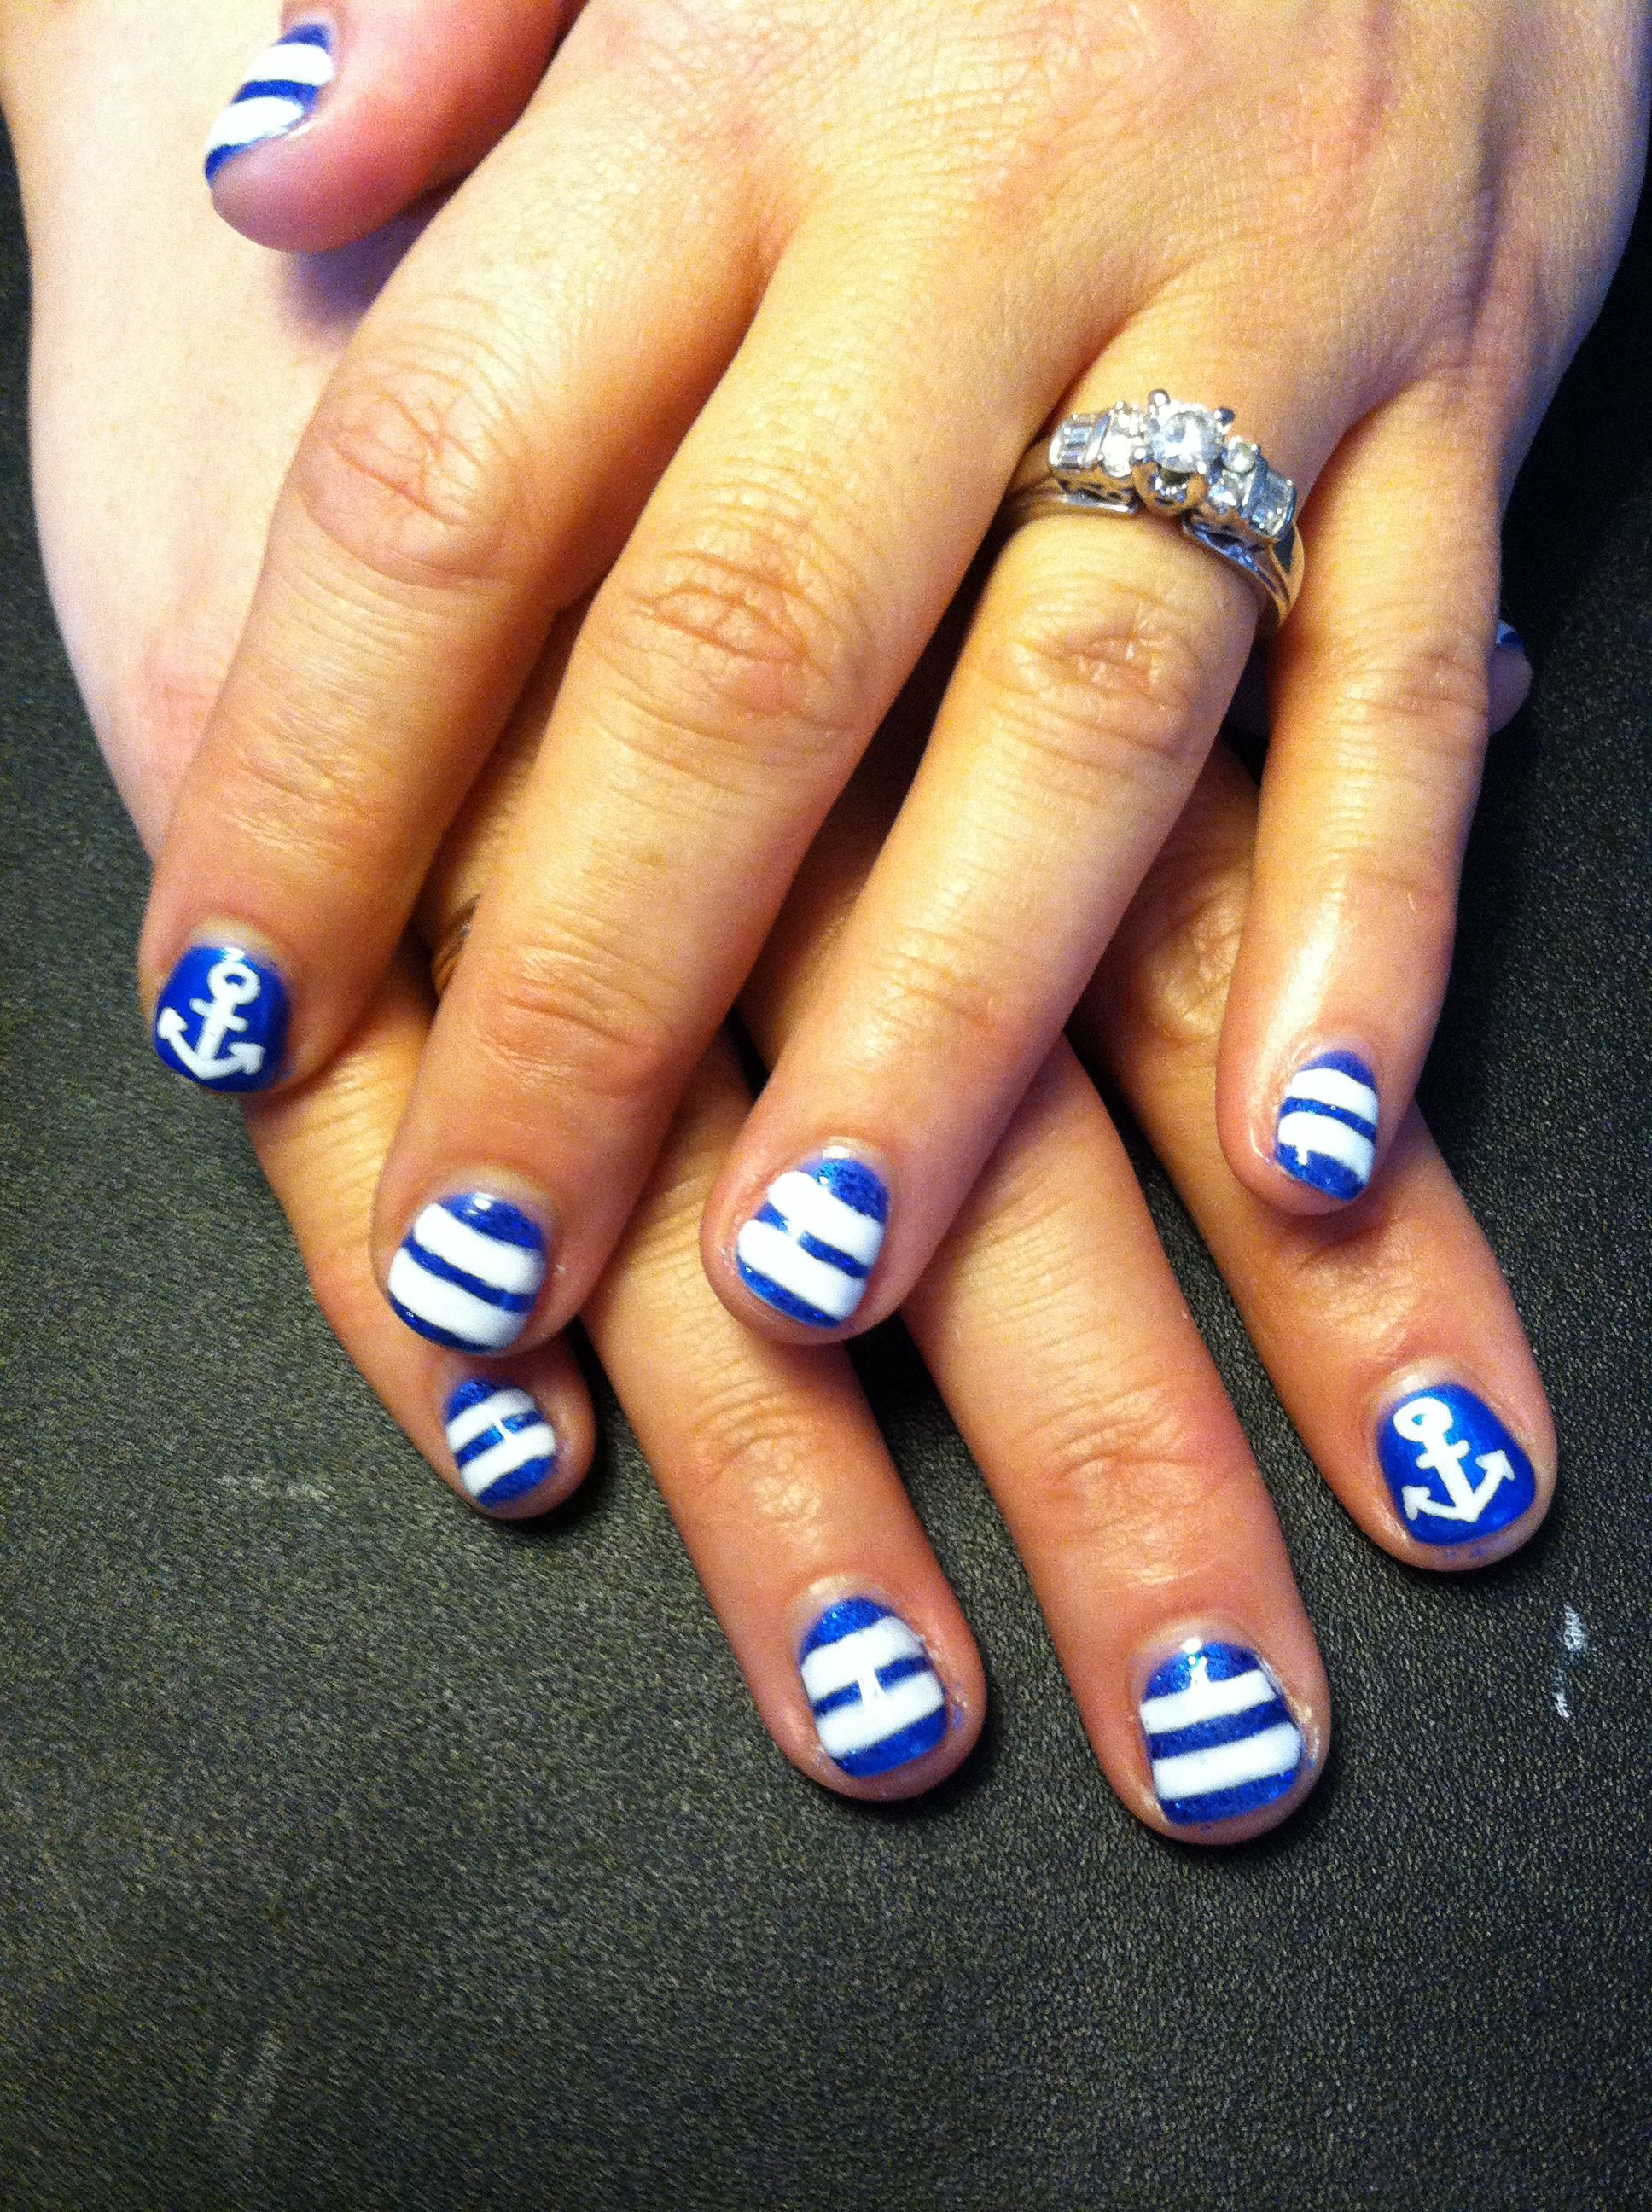 Blue, stripes, anchors, white